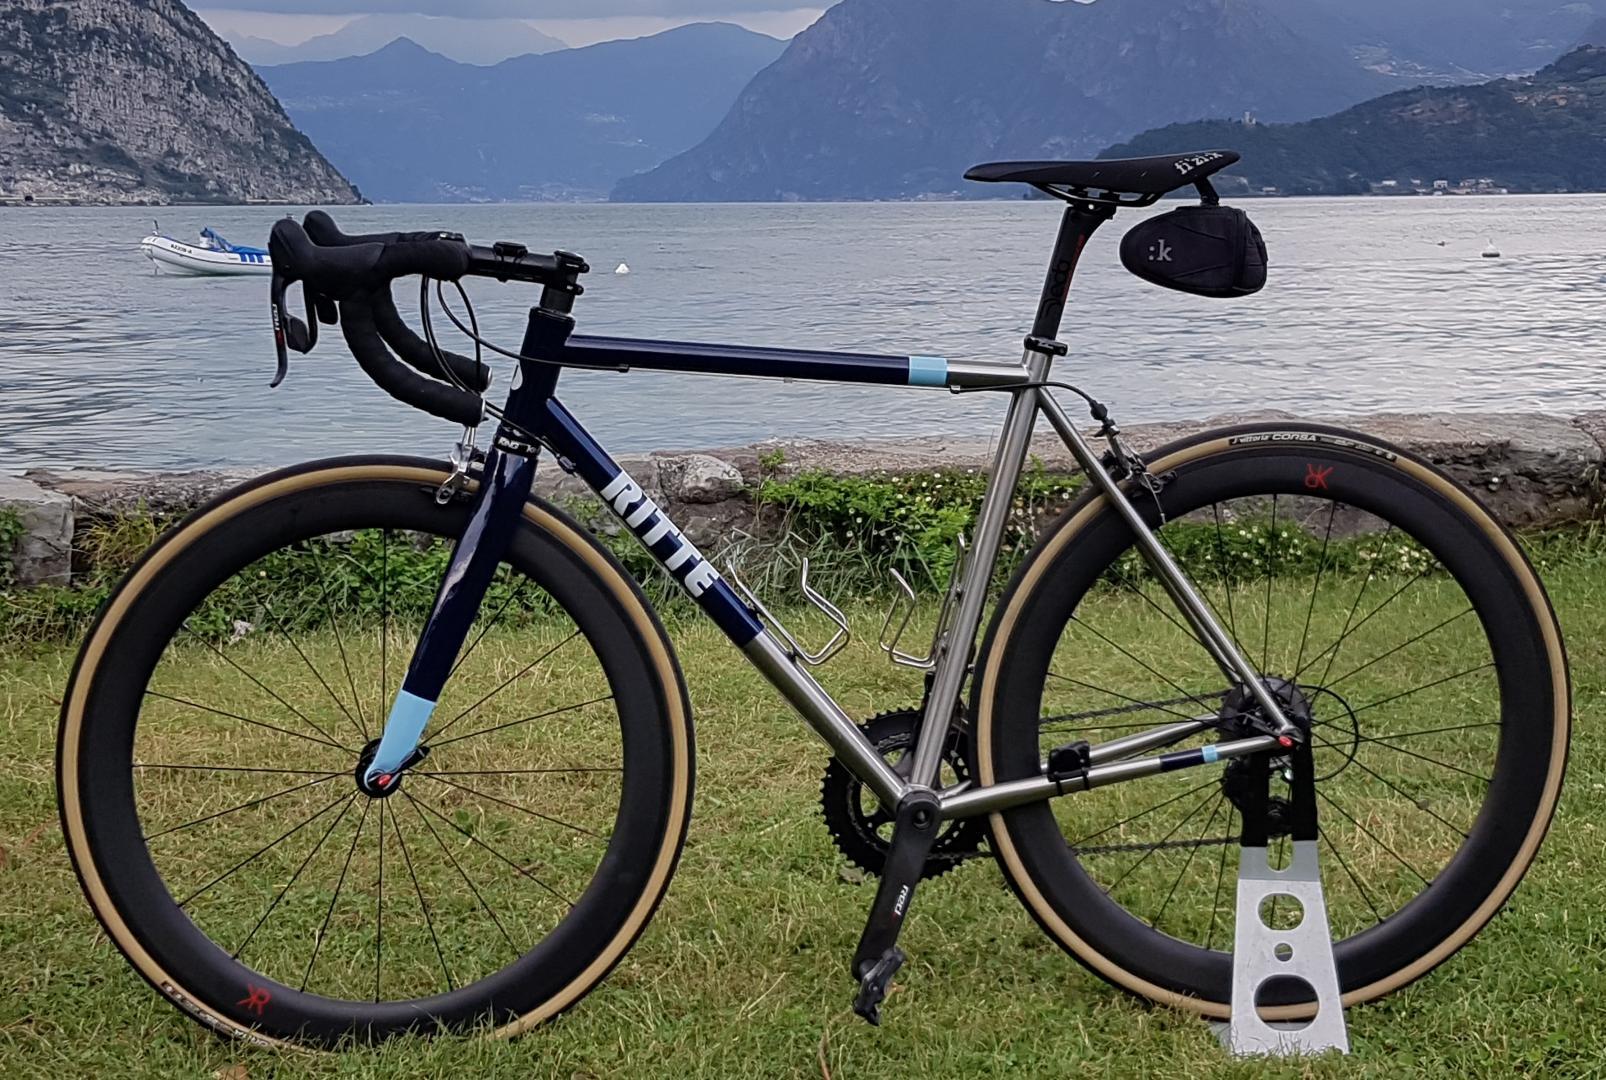 carbon-fiber-700c-55mm-deep-25mm-wide-road-bike-wheels